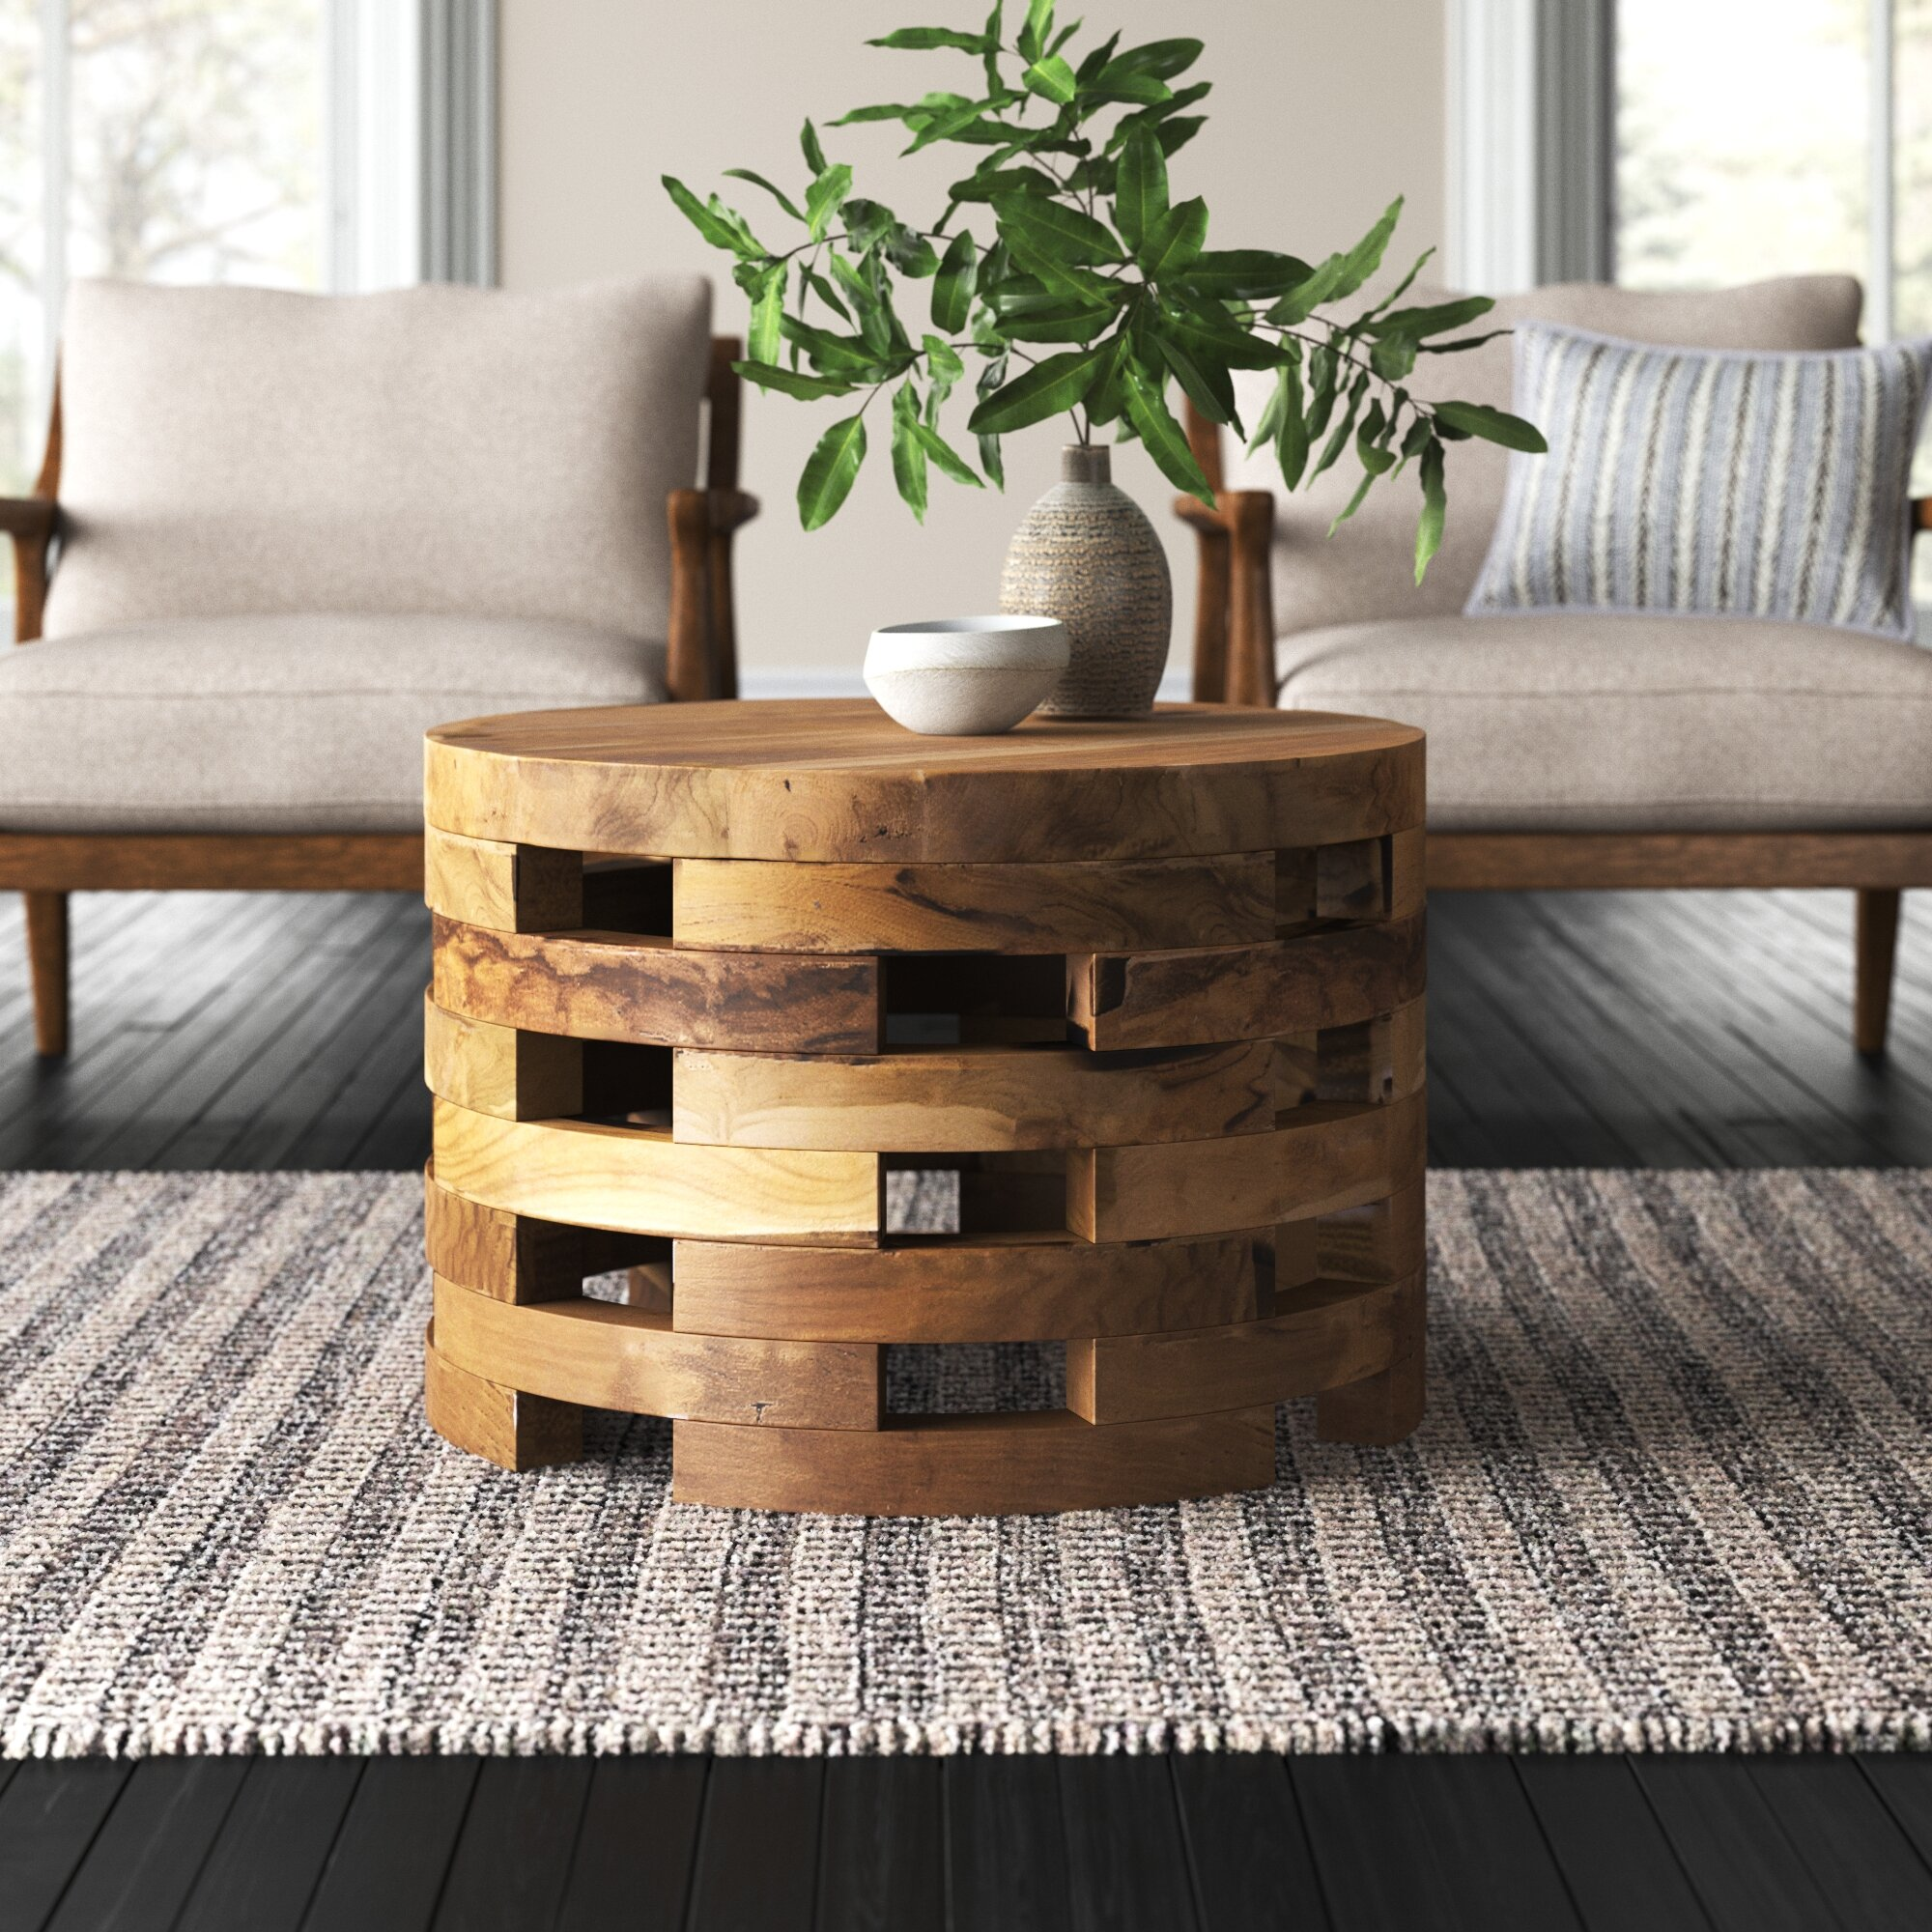 Assembled Modern Farmhouse Coffee Tables You Ll Love In 2021 Wayfair